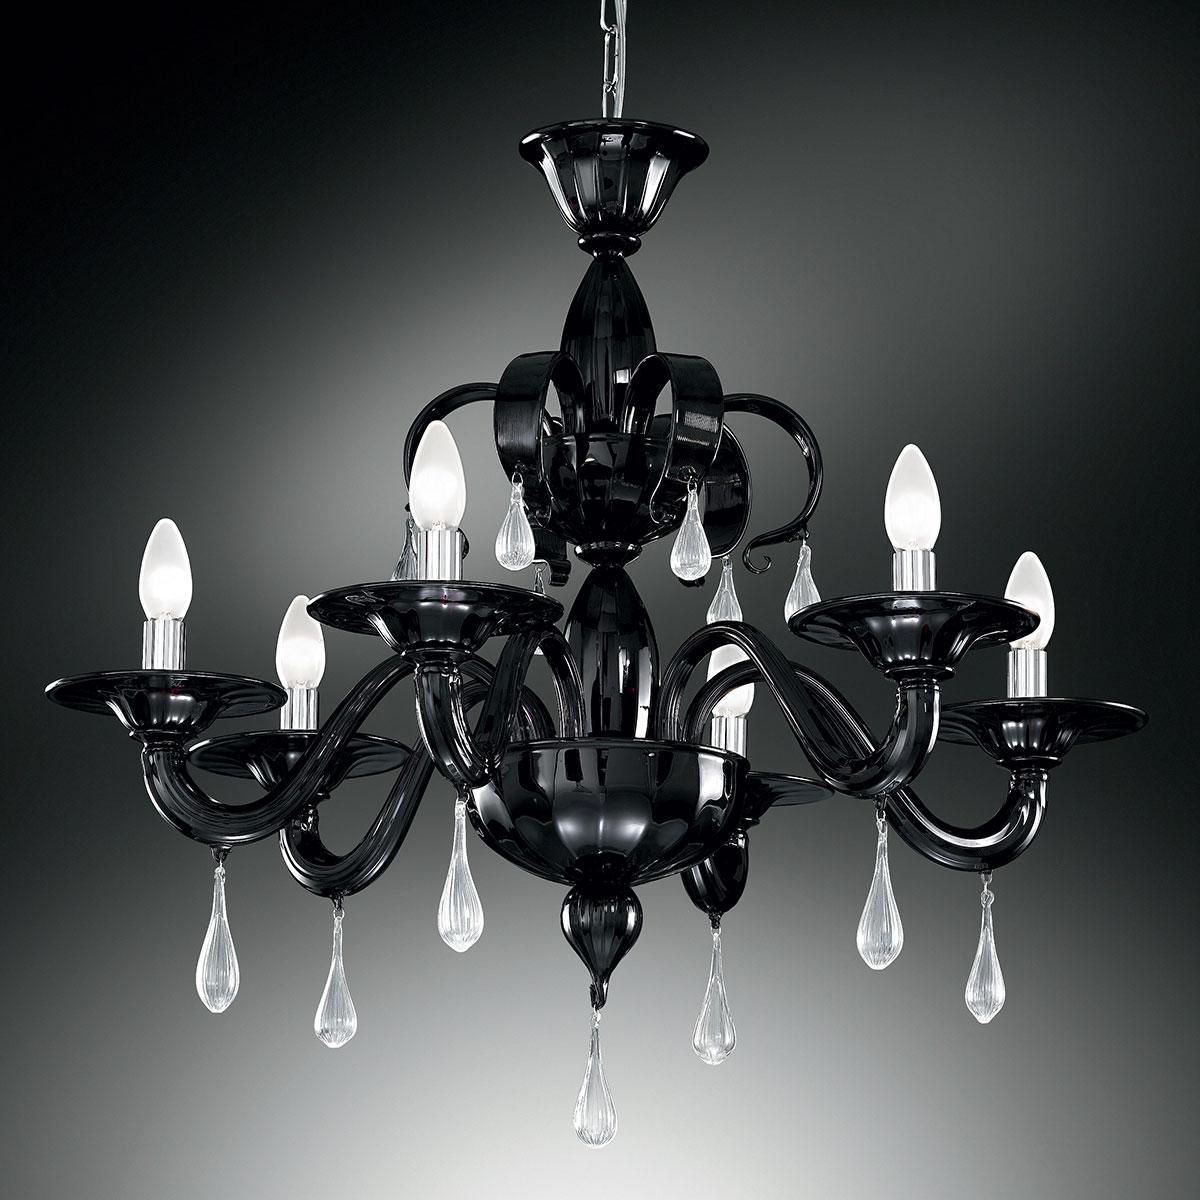 """Olivia"" Murano glass chandelier - 6 lights - black and transparent"